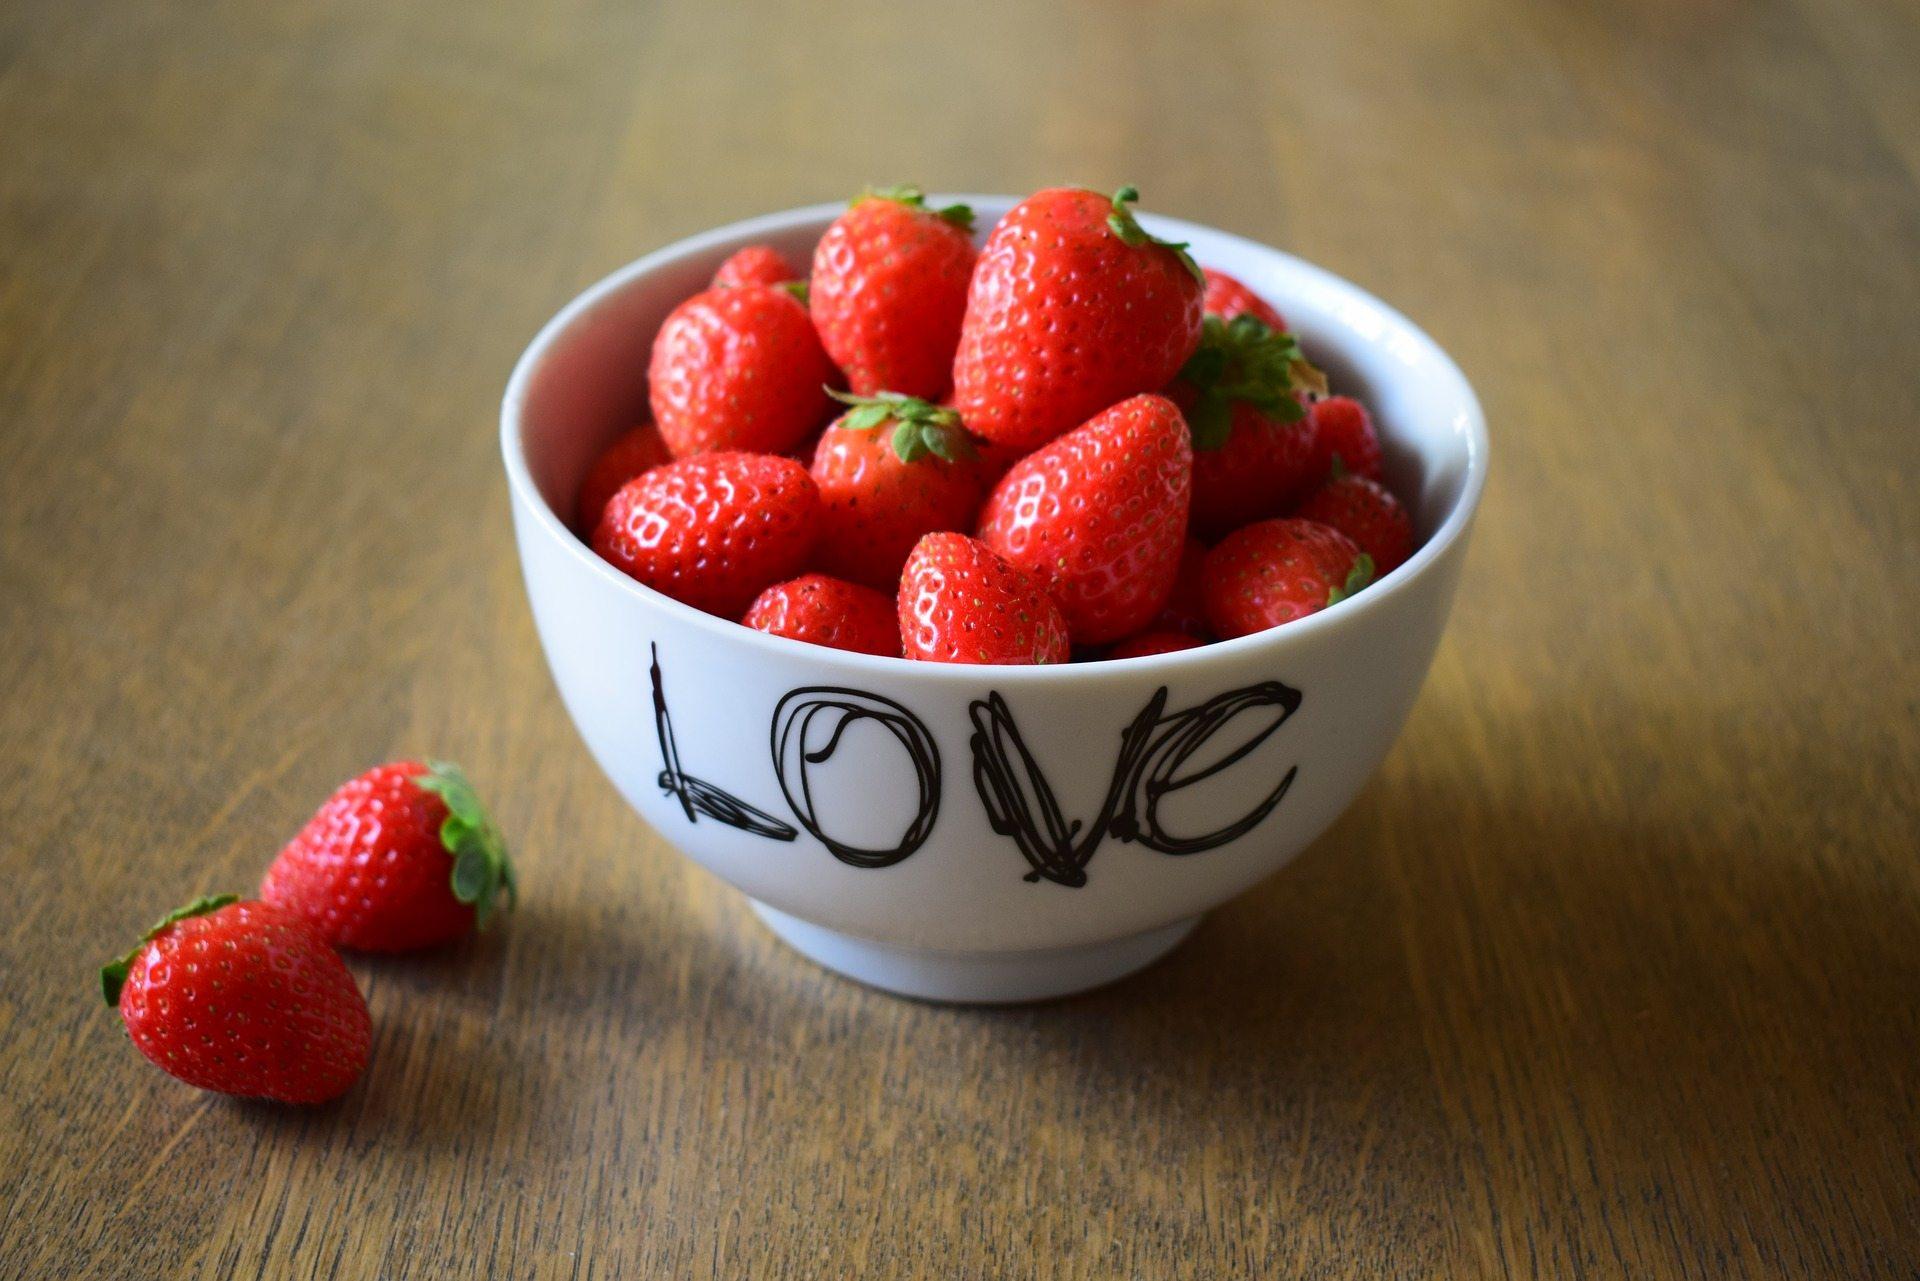 Showing love - Pixabay strawberries-1710108_1920